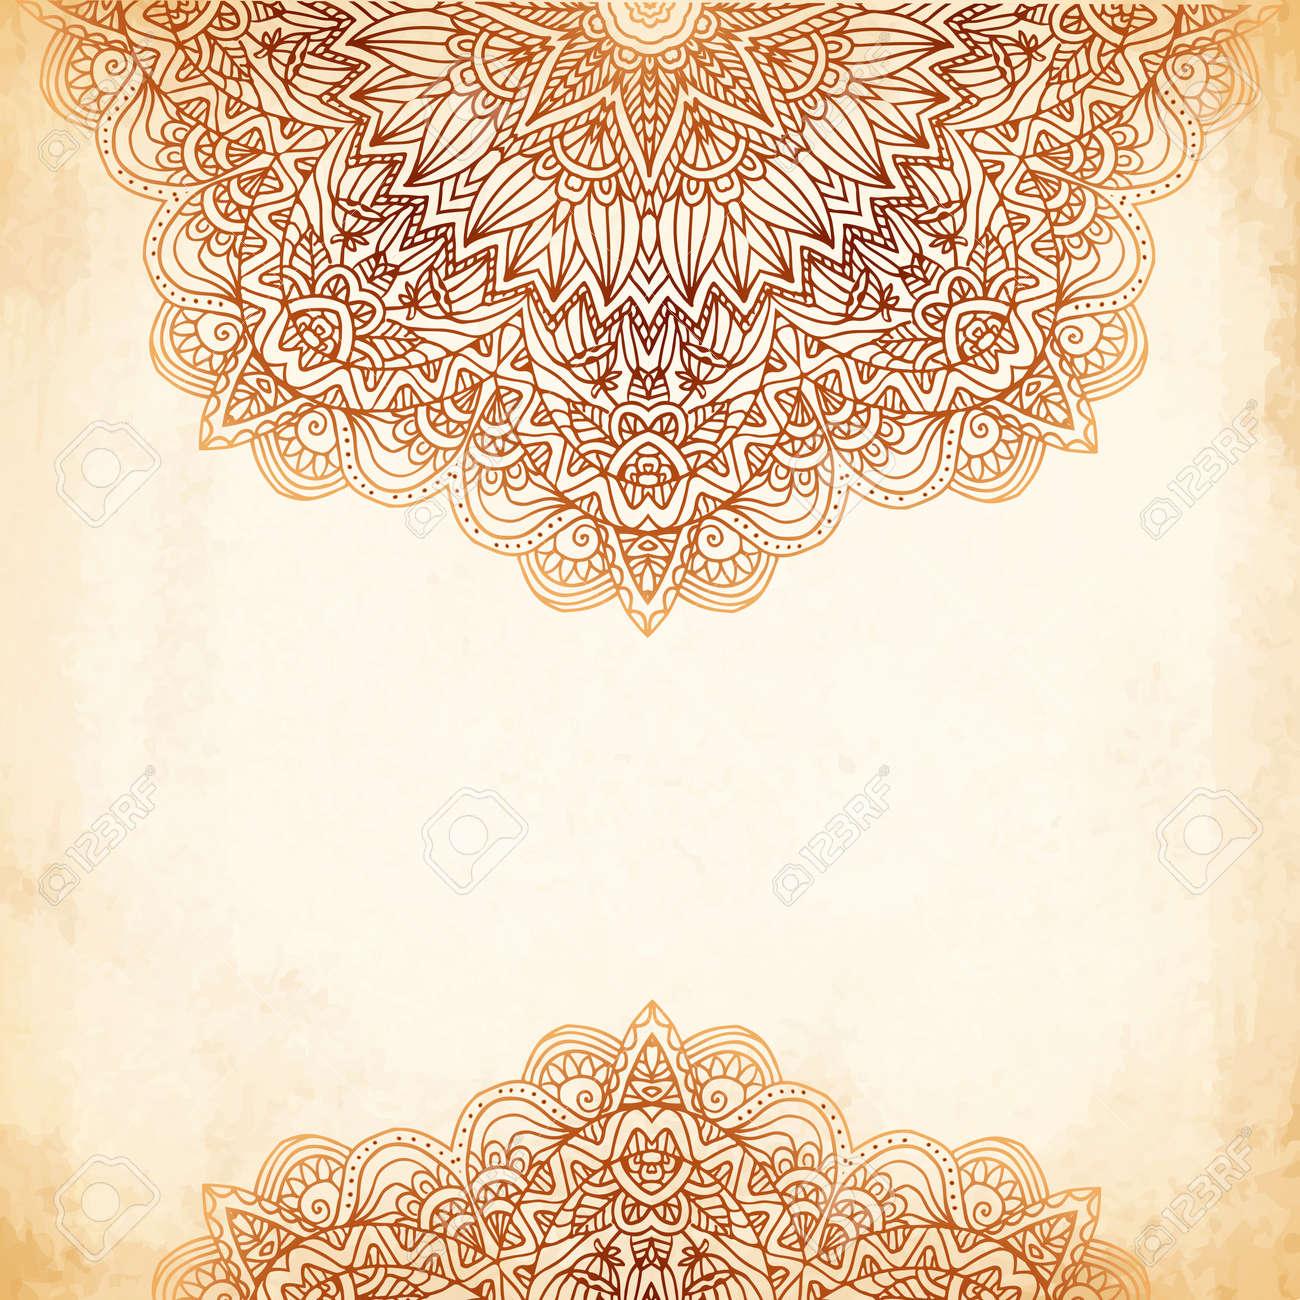 Ornate vintage vector background in mehndi style royalty free stock - Ornate Vintage Beige Vector Background In Mehndi Style Stock Vector 20914540